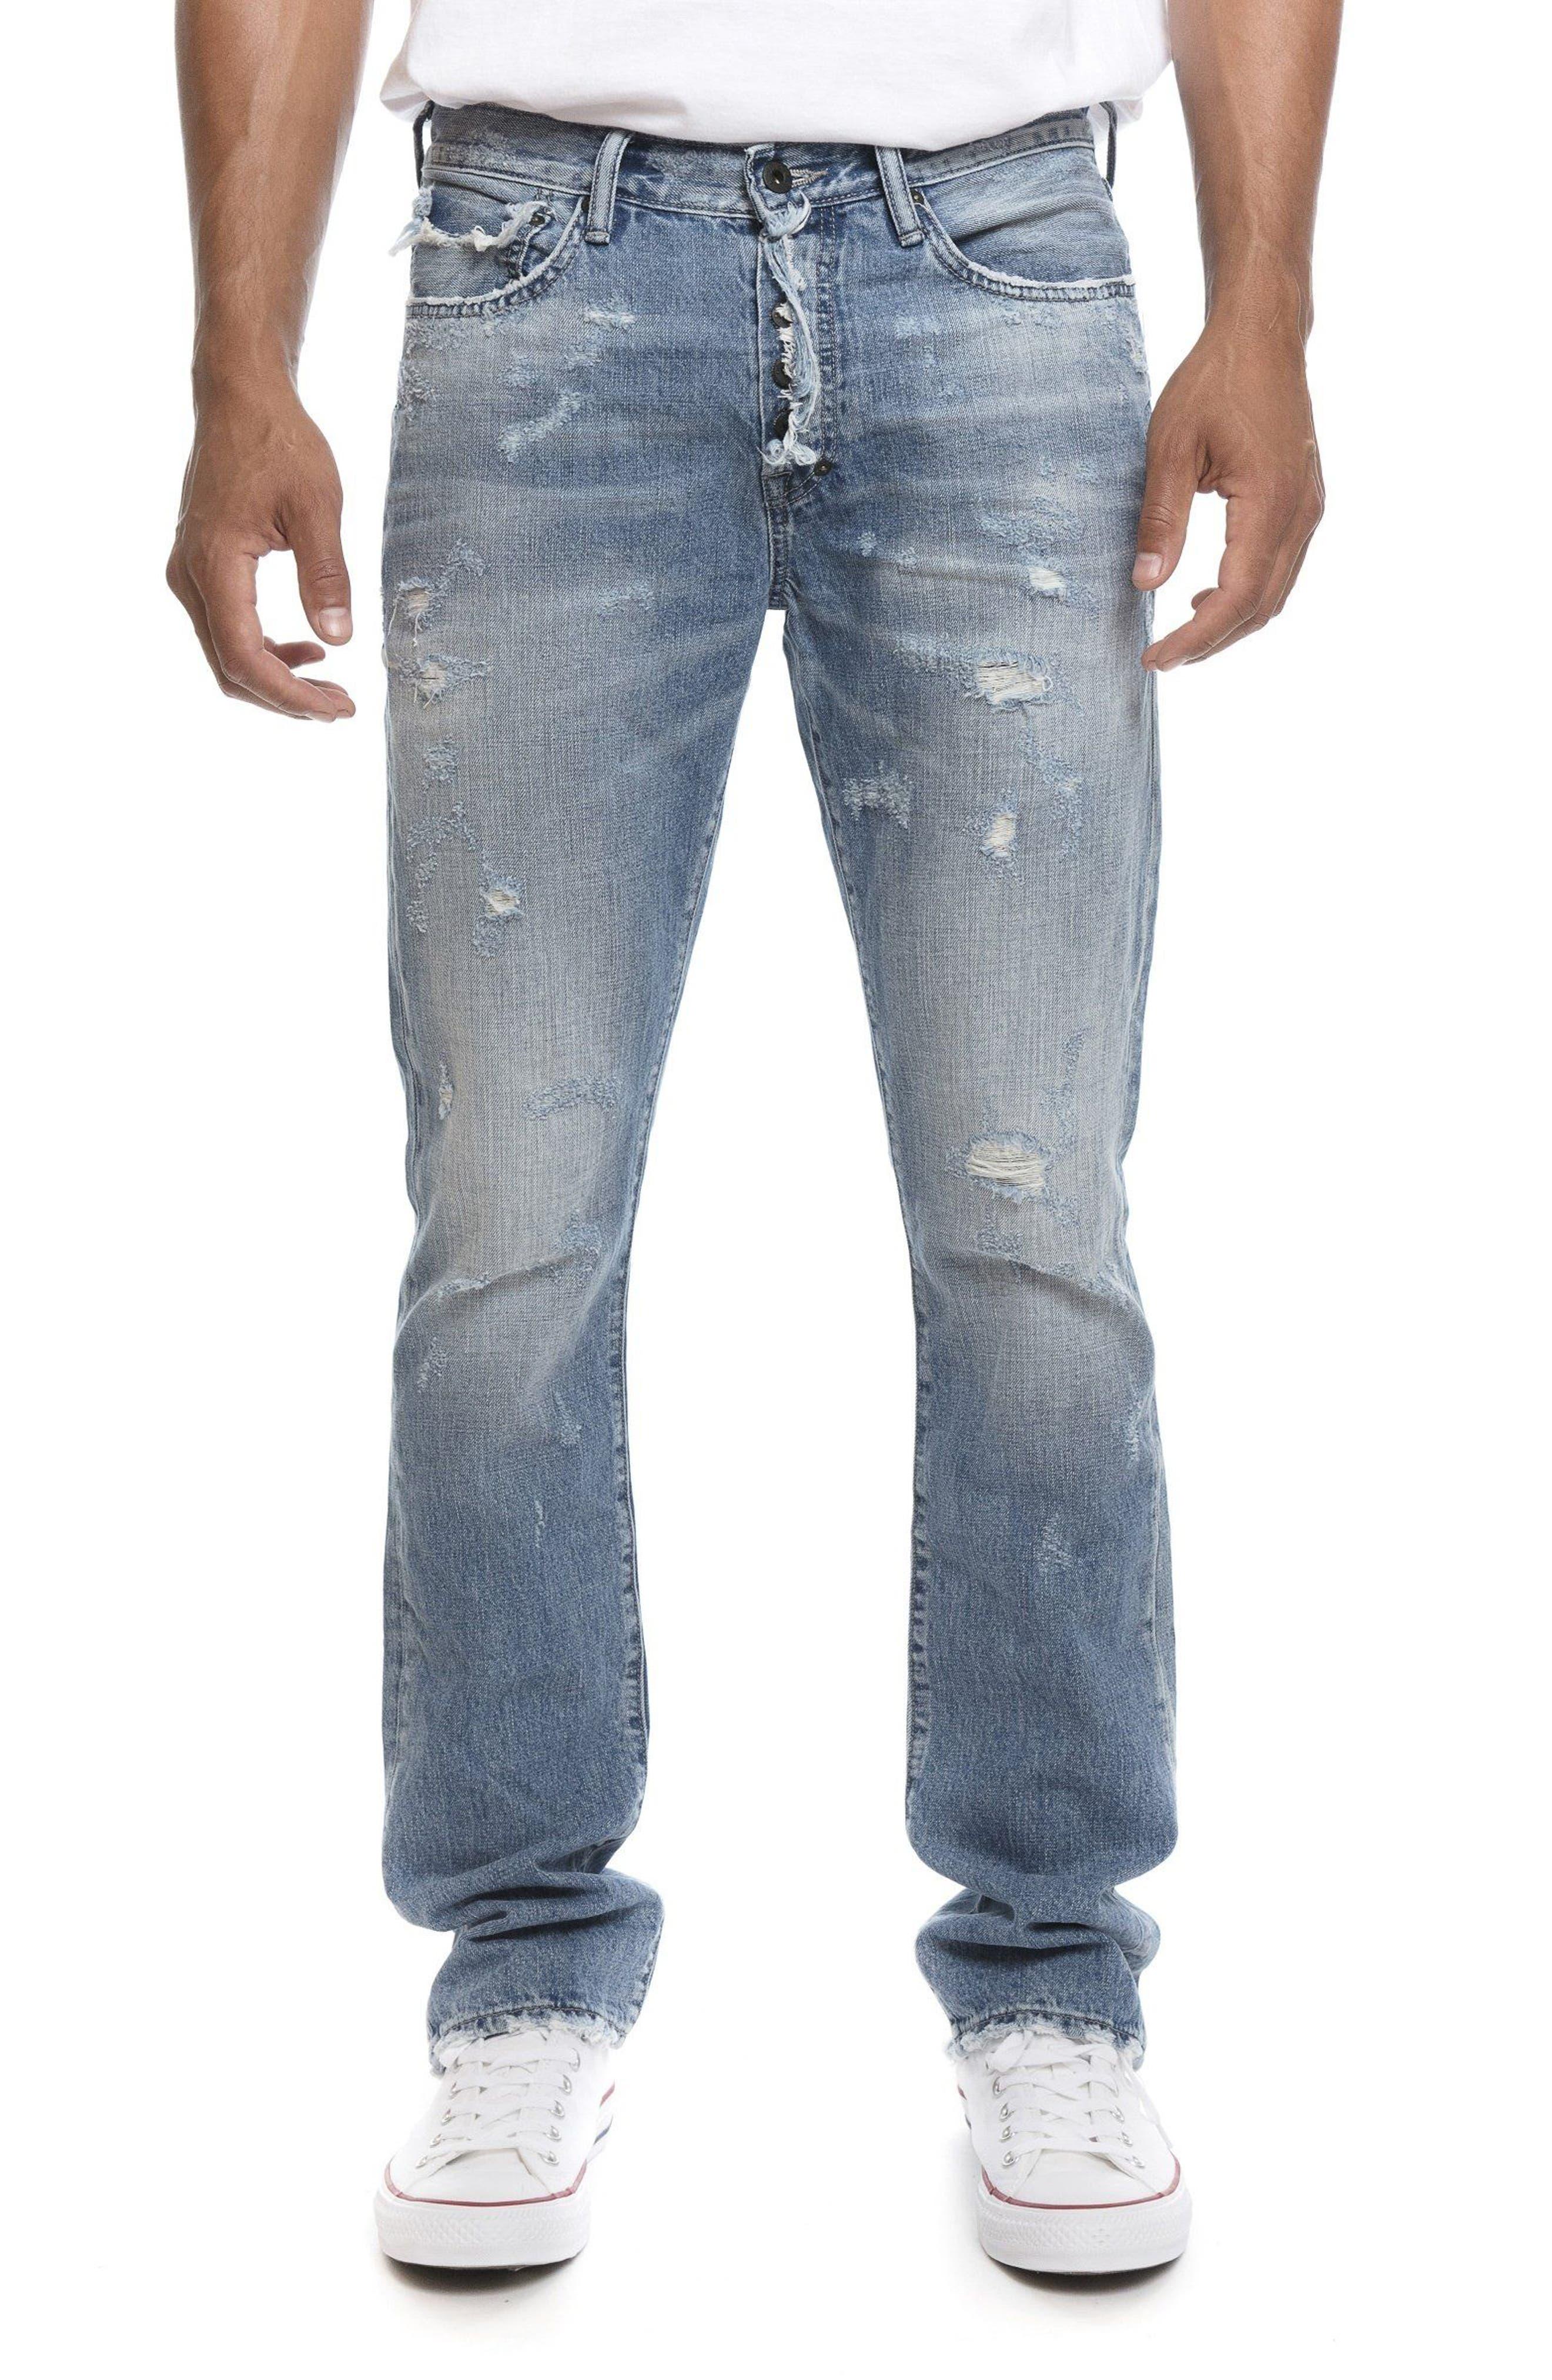 Demon Slim Straight Leg Jeans,                             Main thumbnail 1, color,                             454